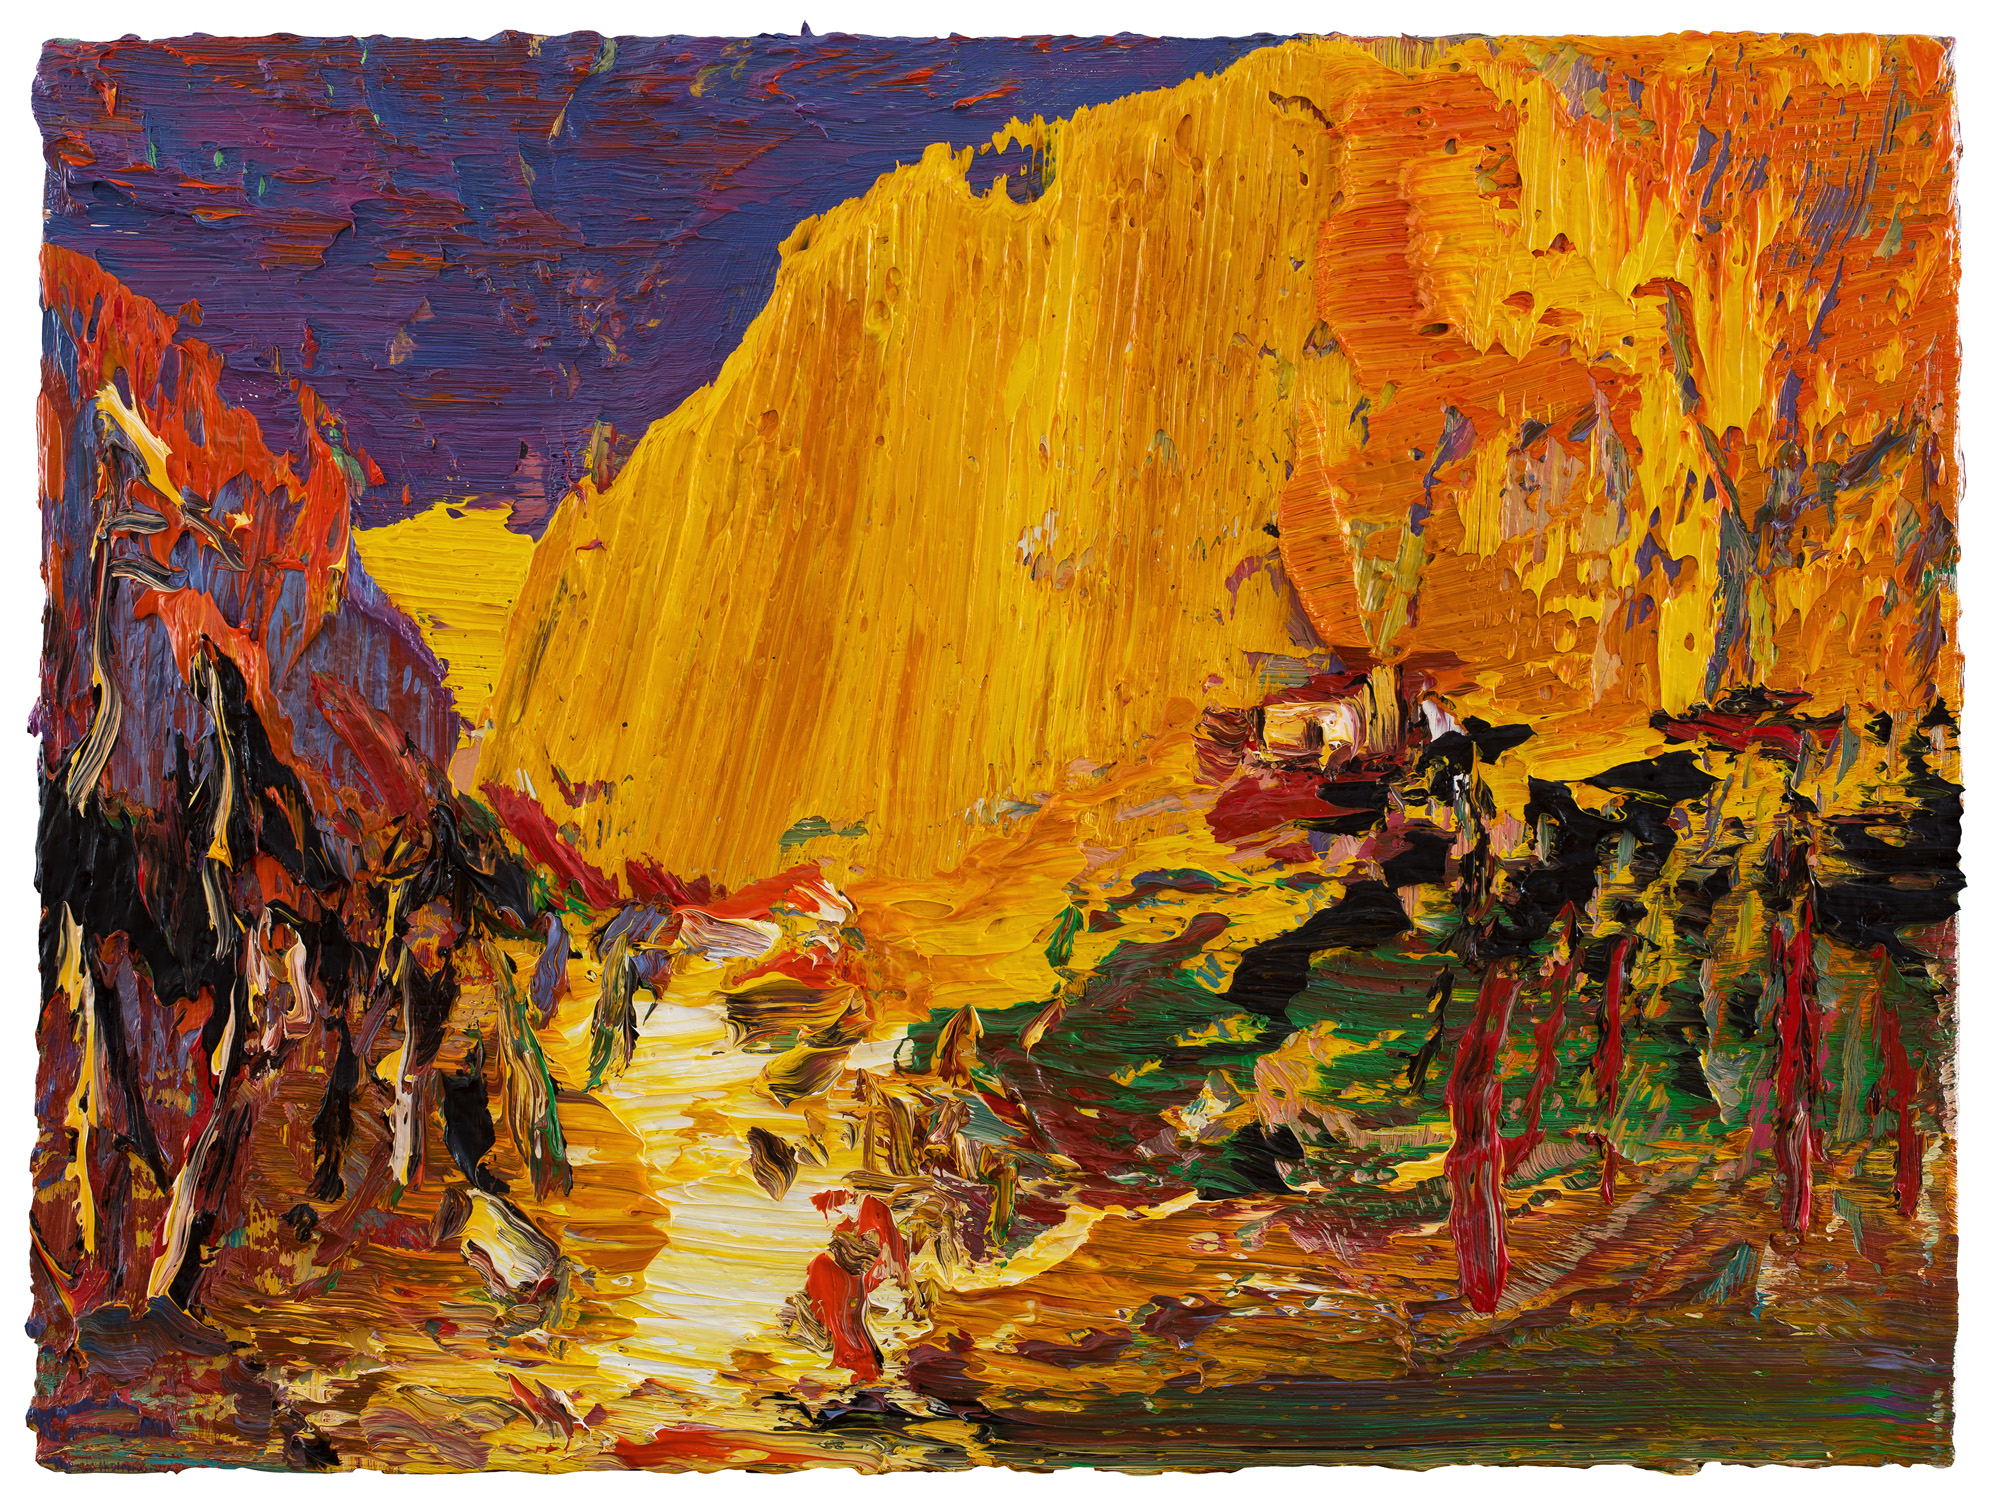 Yin Zhaoyang   Songshan mountain autumn , 2018 Oil on canvas 60 x 80 cm